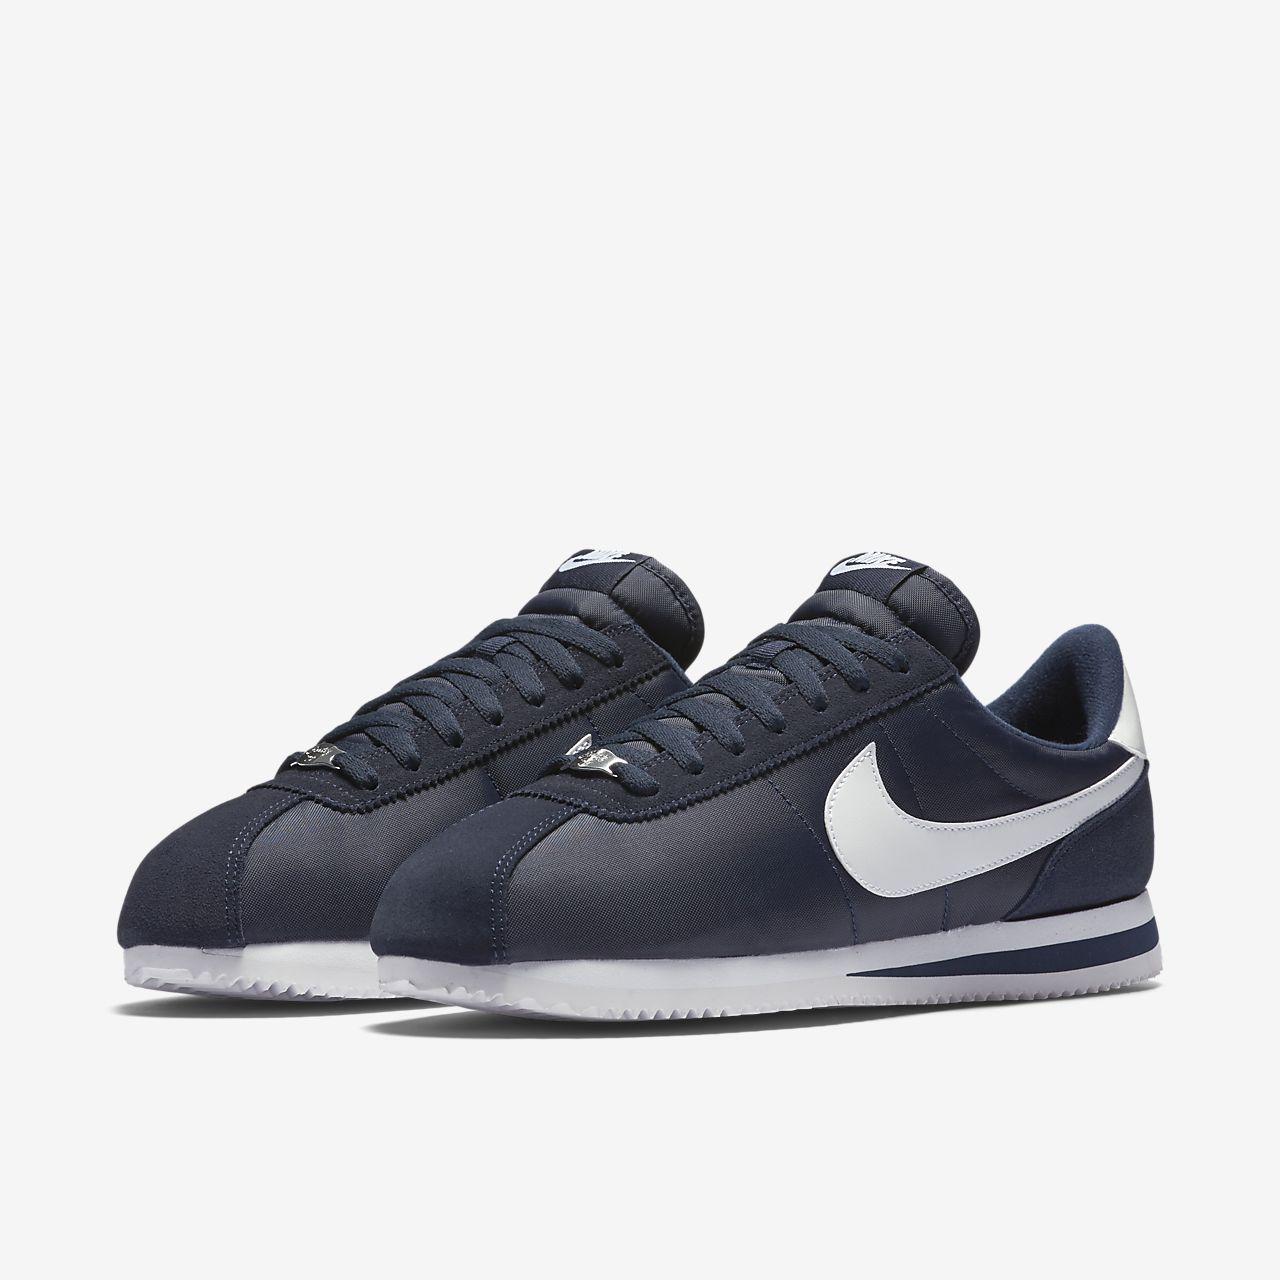 new styles 211c4 91d85 ... Nike Cortez Basic Nylon Men s Shoe